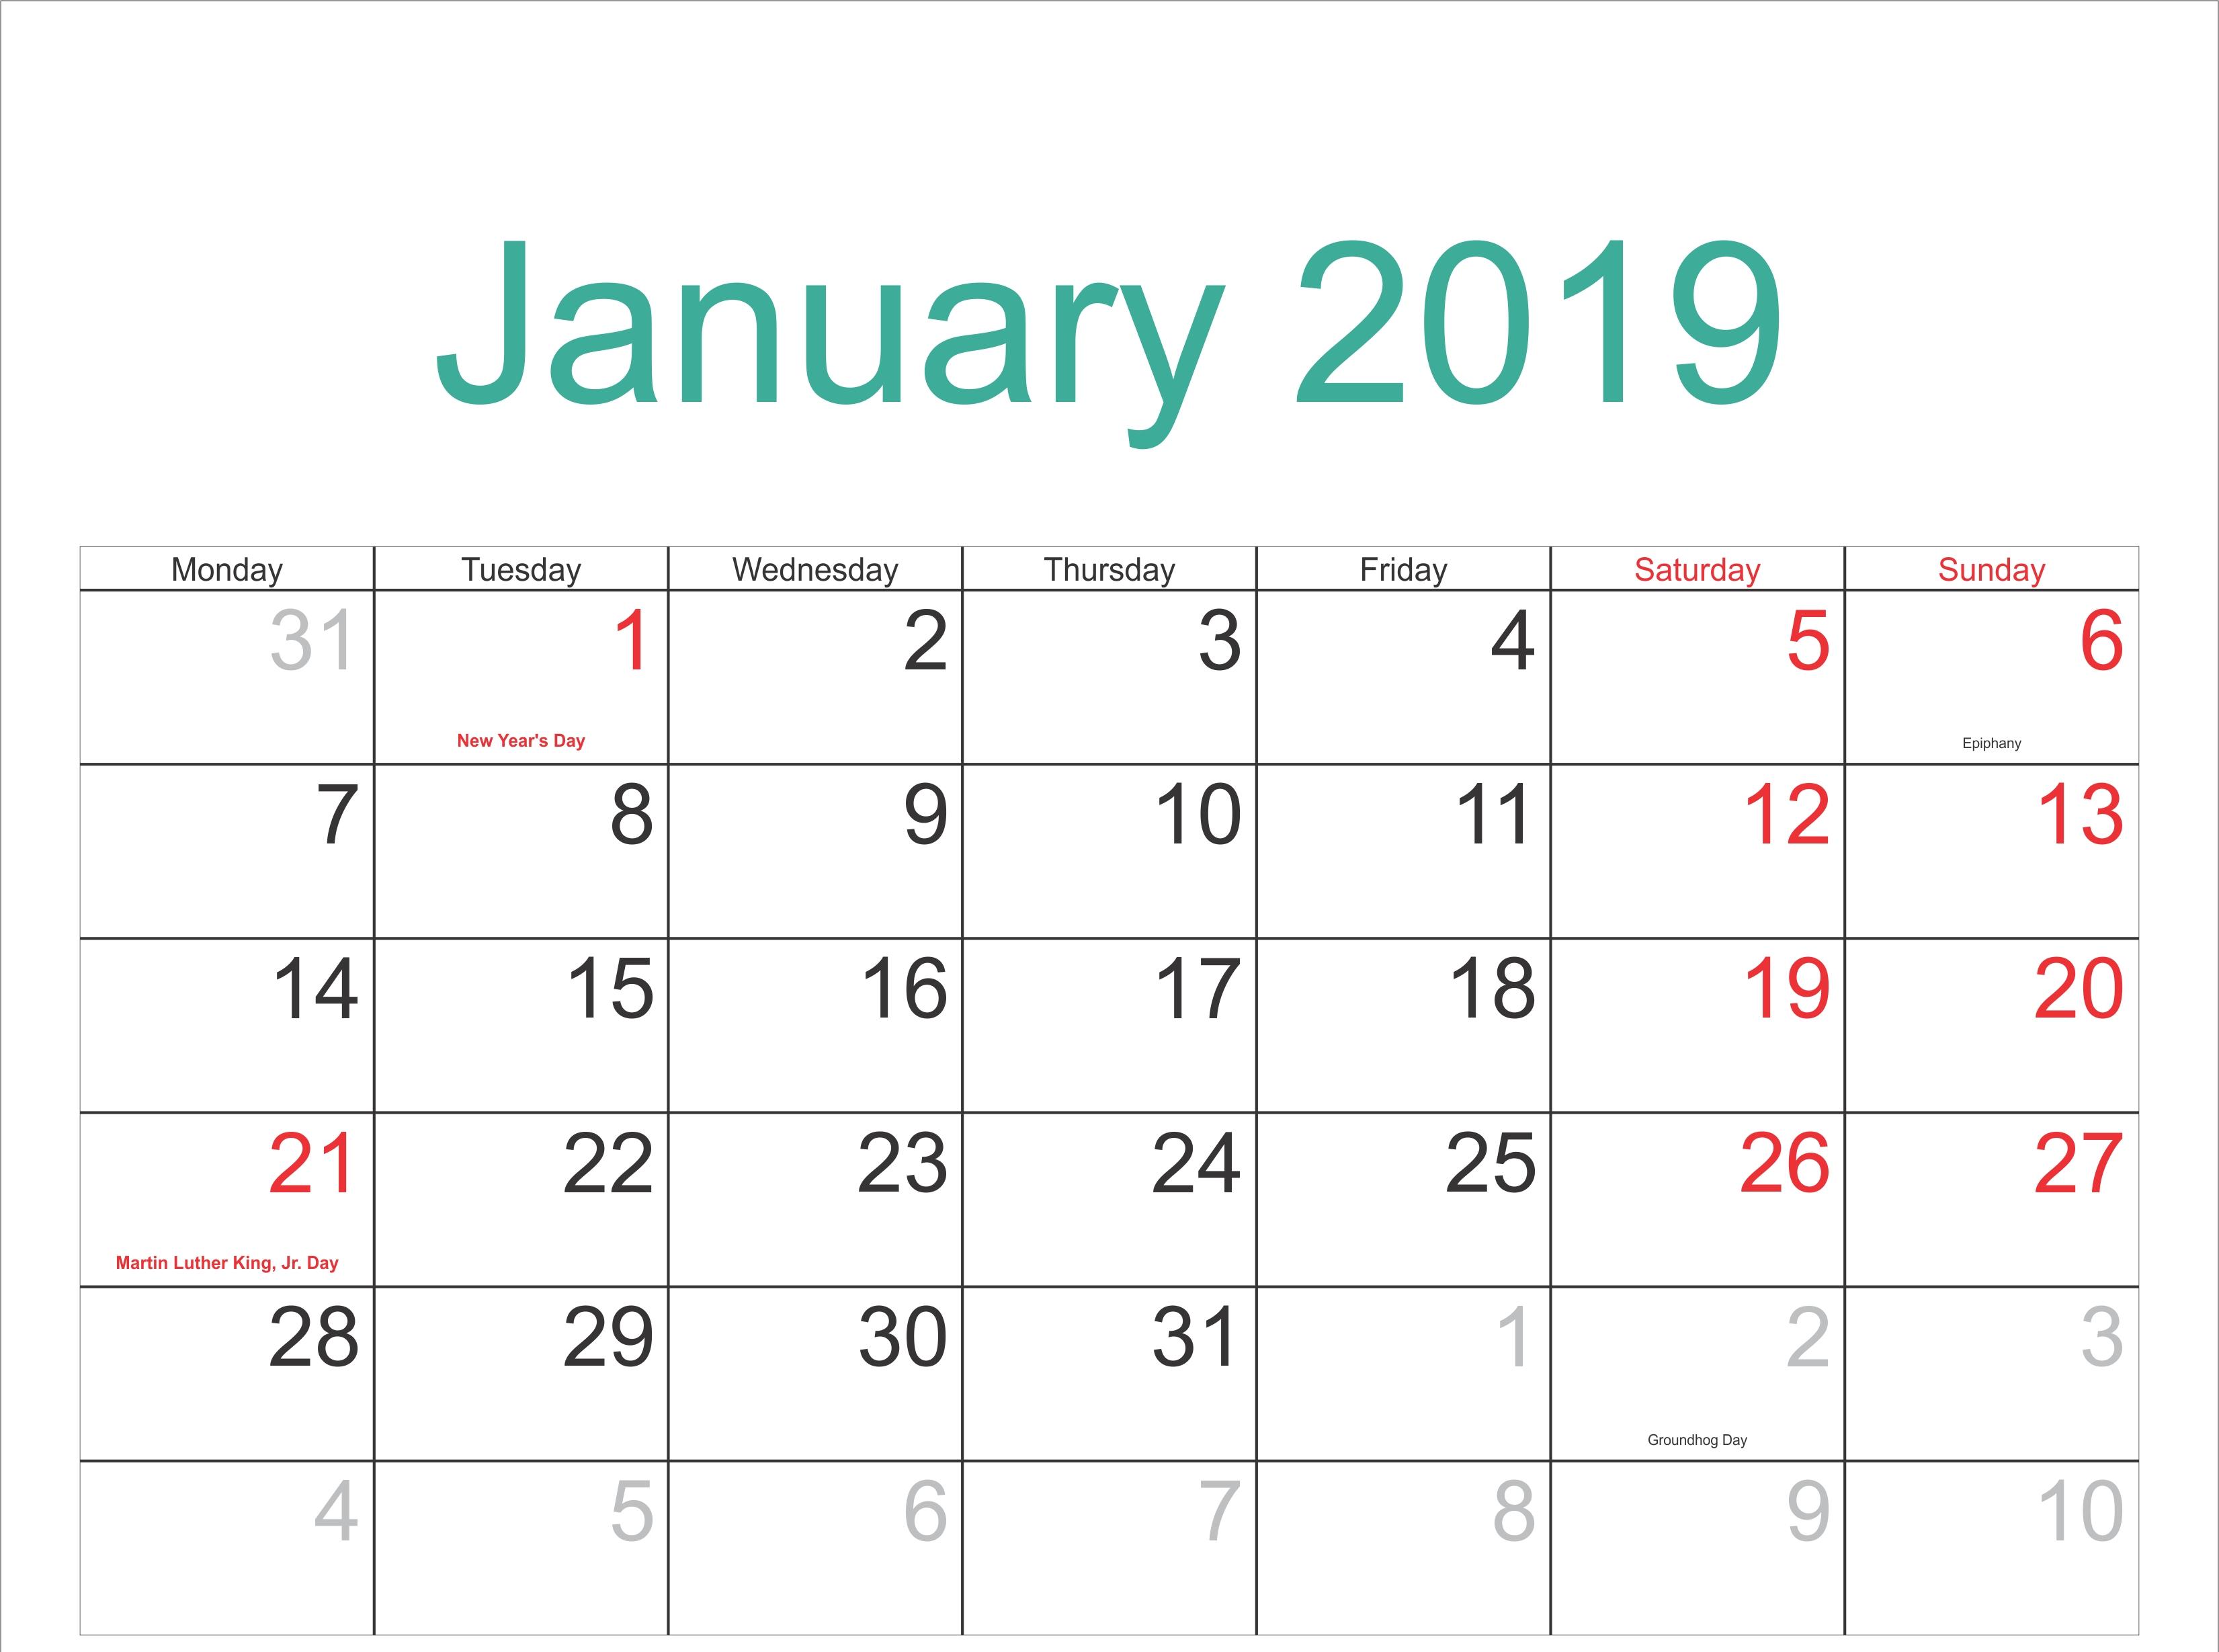 January 2019 Calendar Festivals Pdf - Free January 2019 Calendar Calendar Of 2019 With Festivals